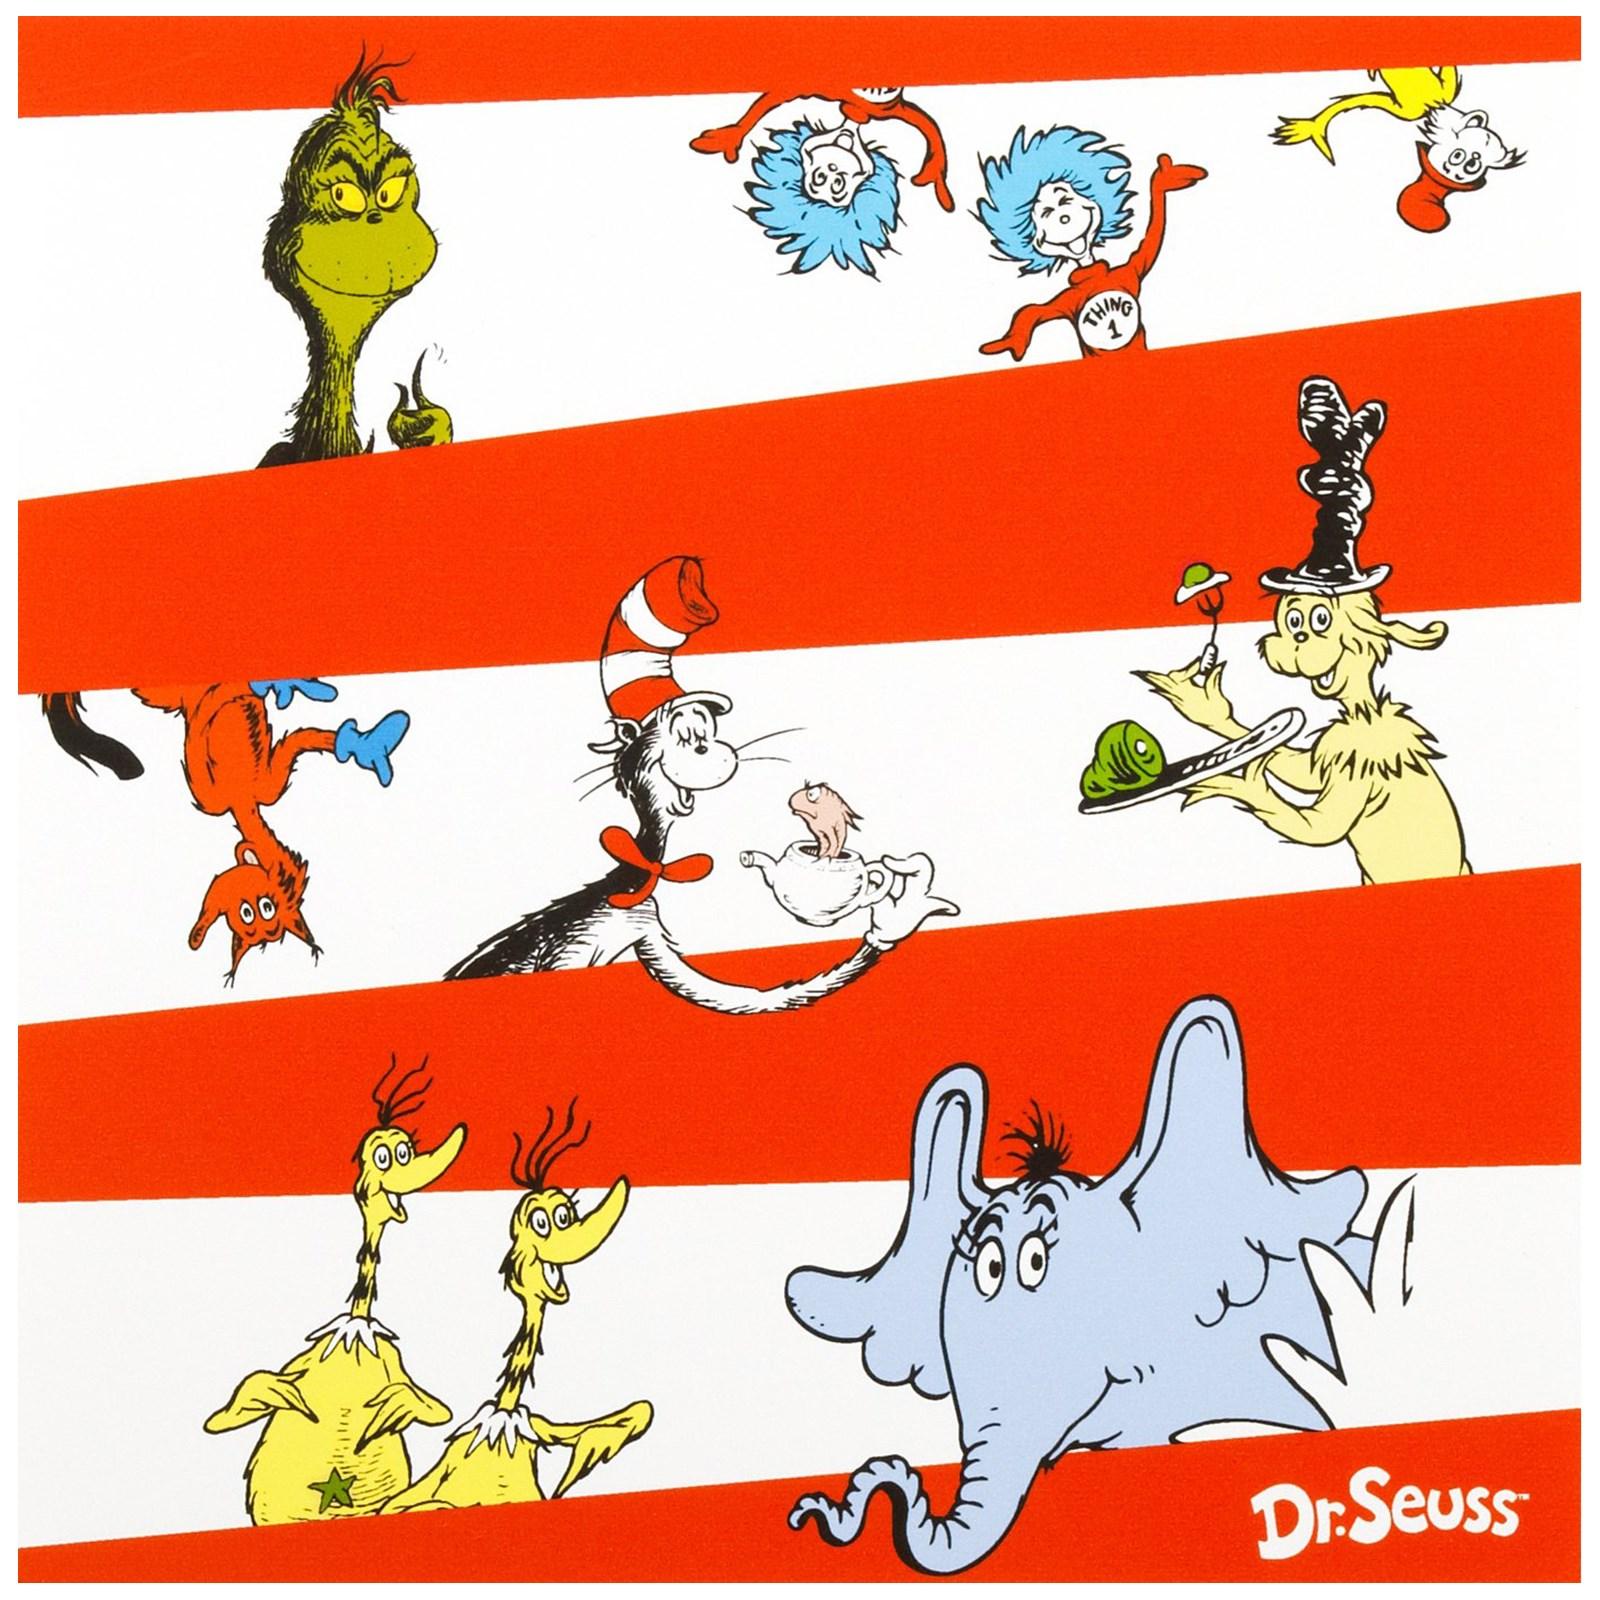 Dr Seuss Invitations is good invitation example